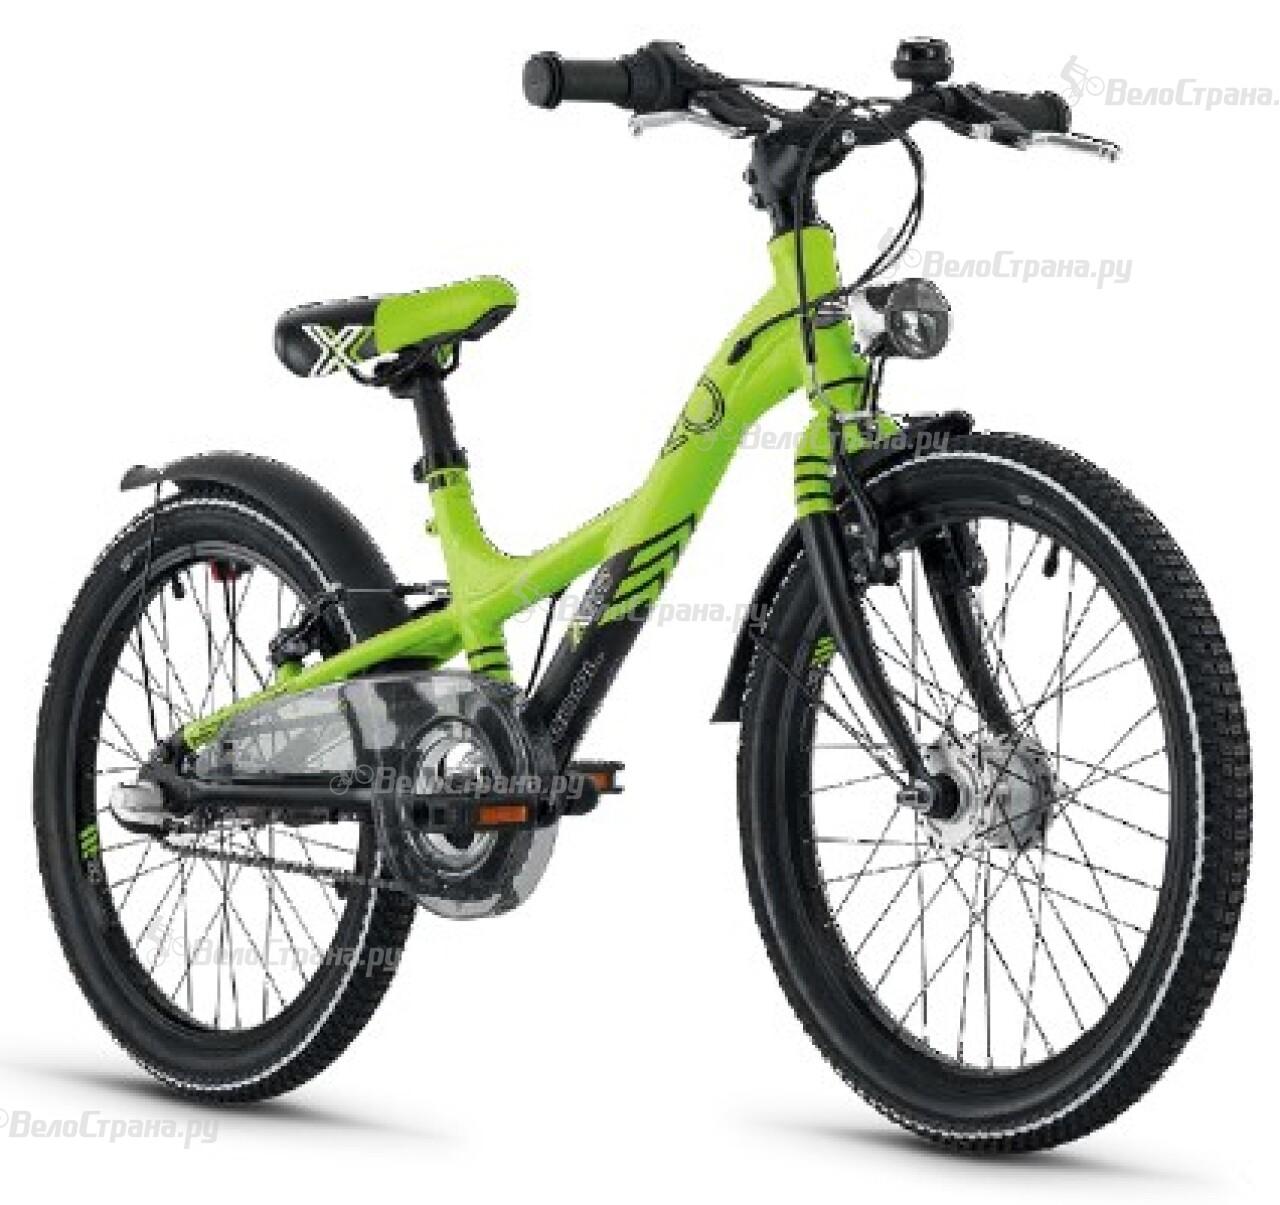 Велосипед Scool XX lite 20 3S (2014) цена